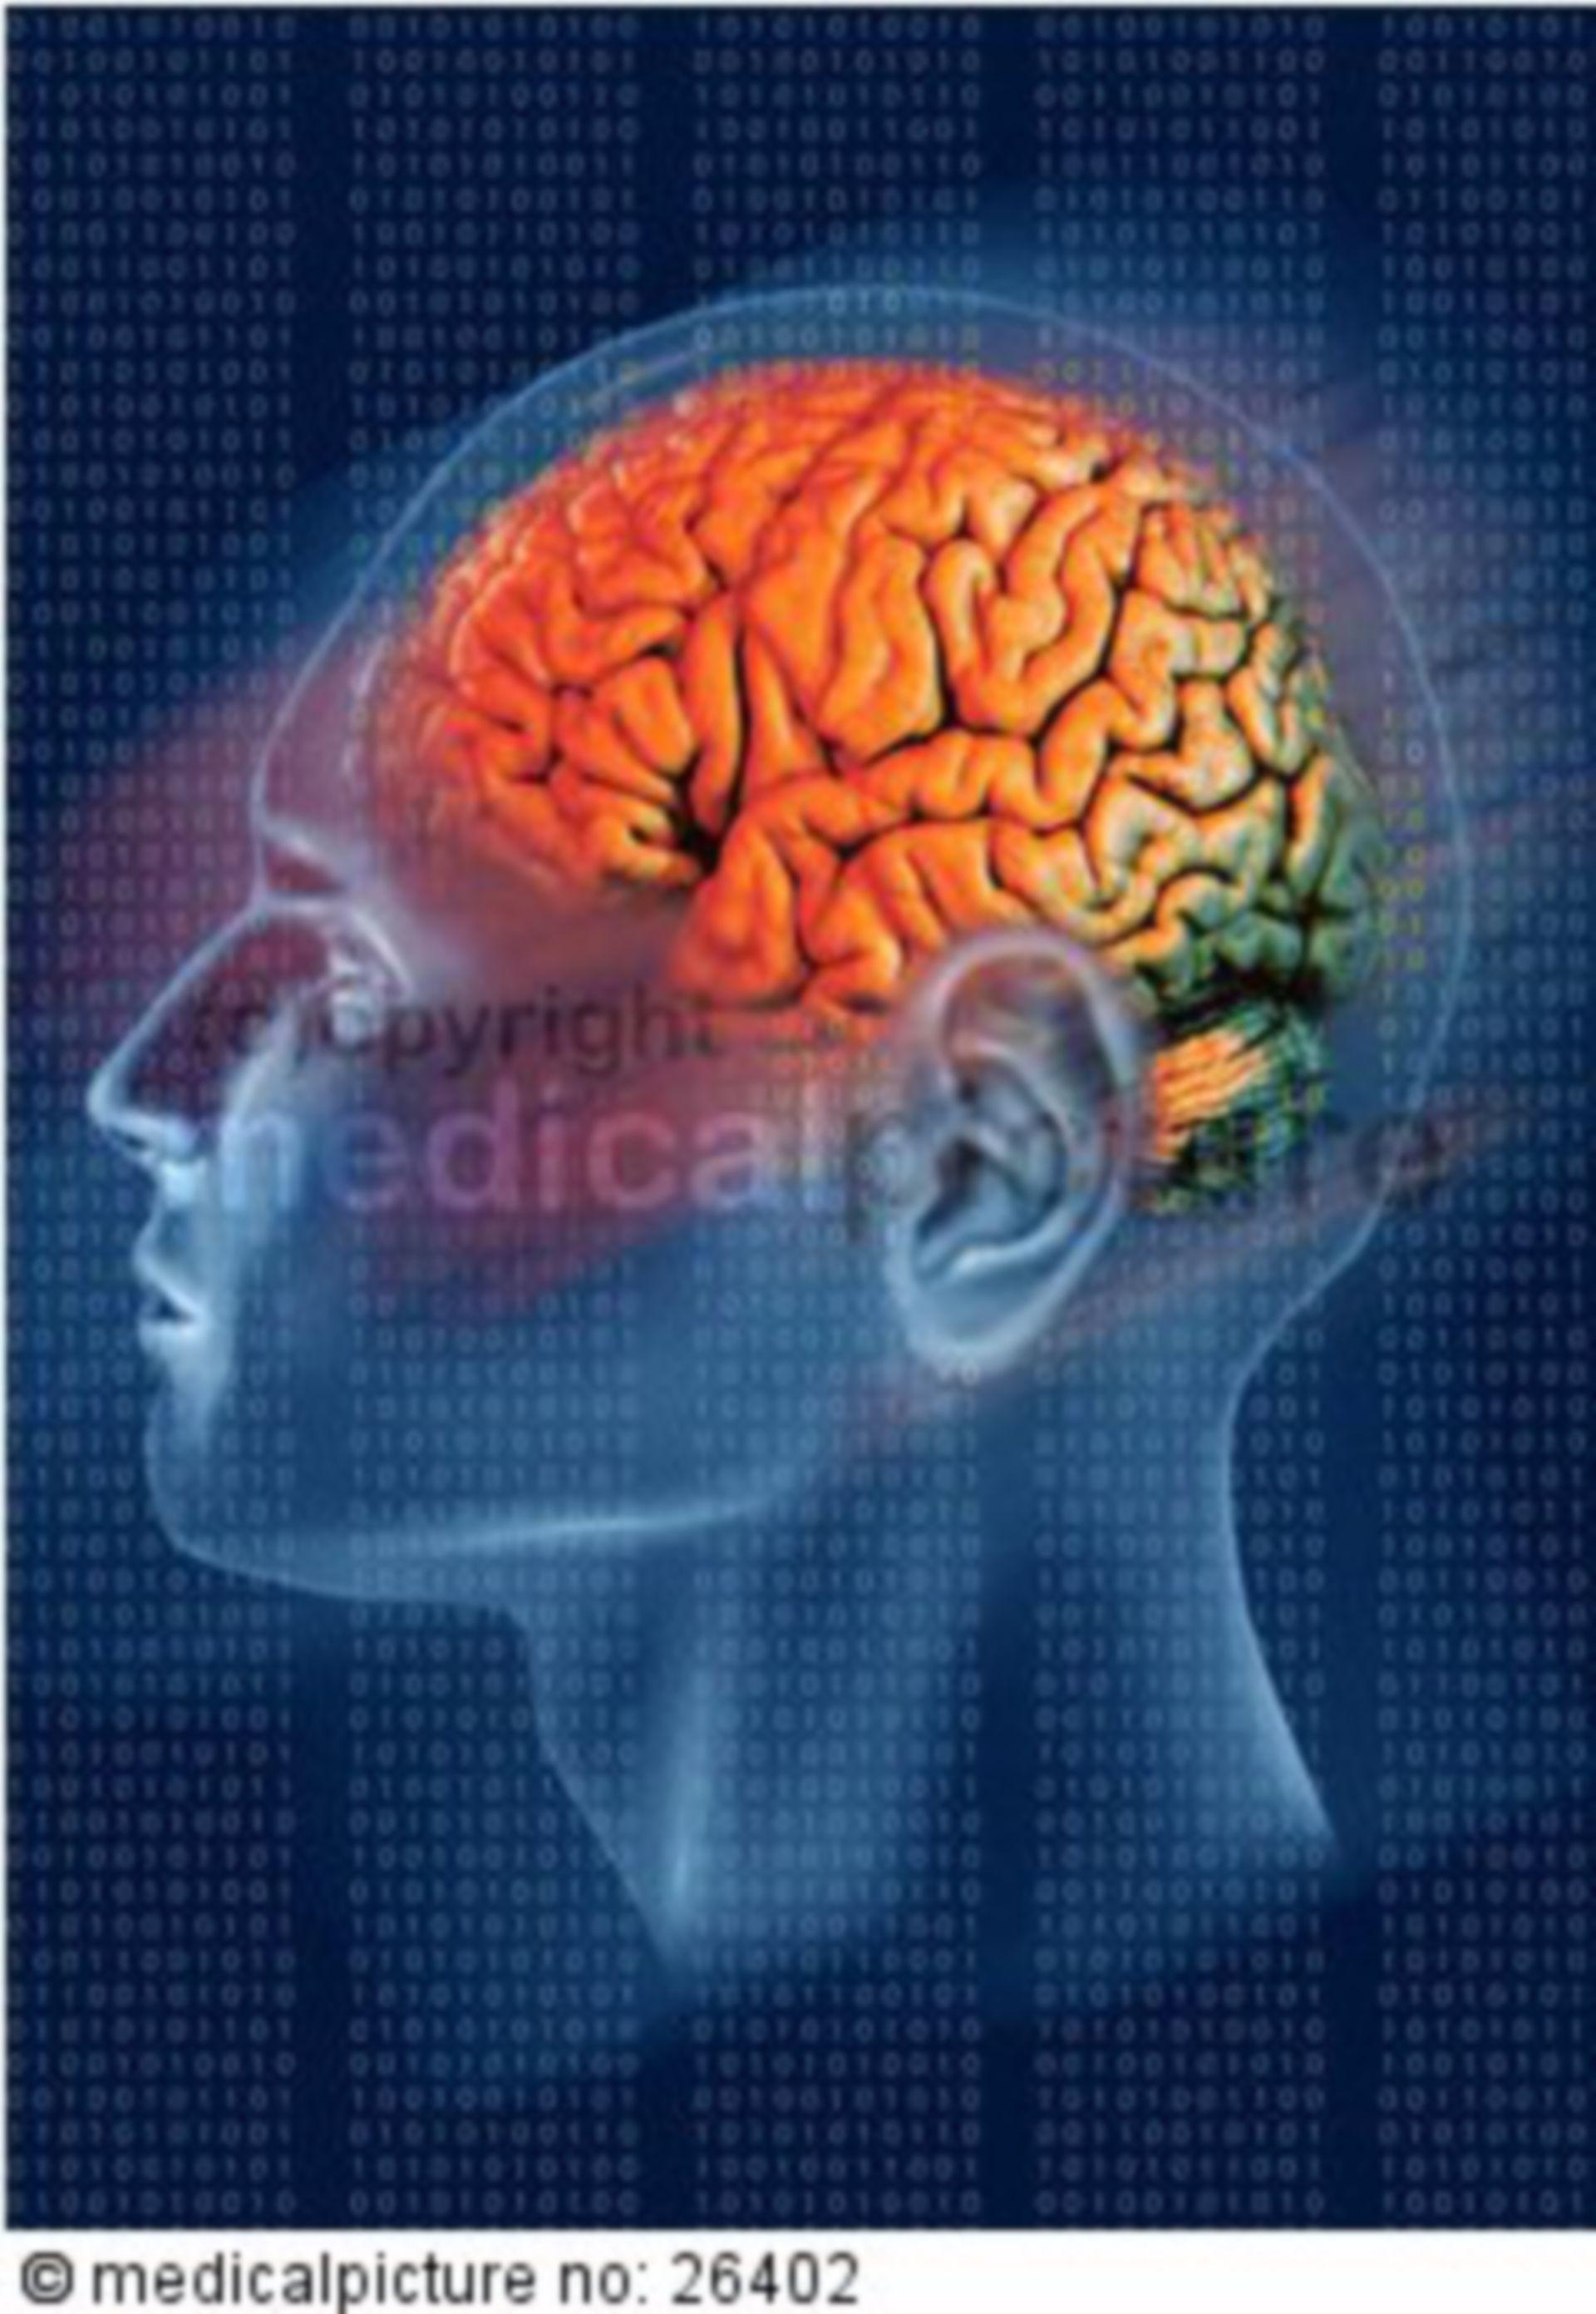 Gehirn mit binaerem Code, brain with binary code